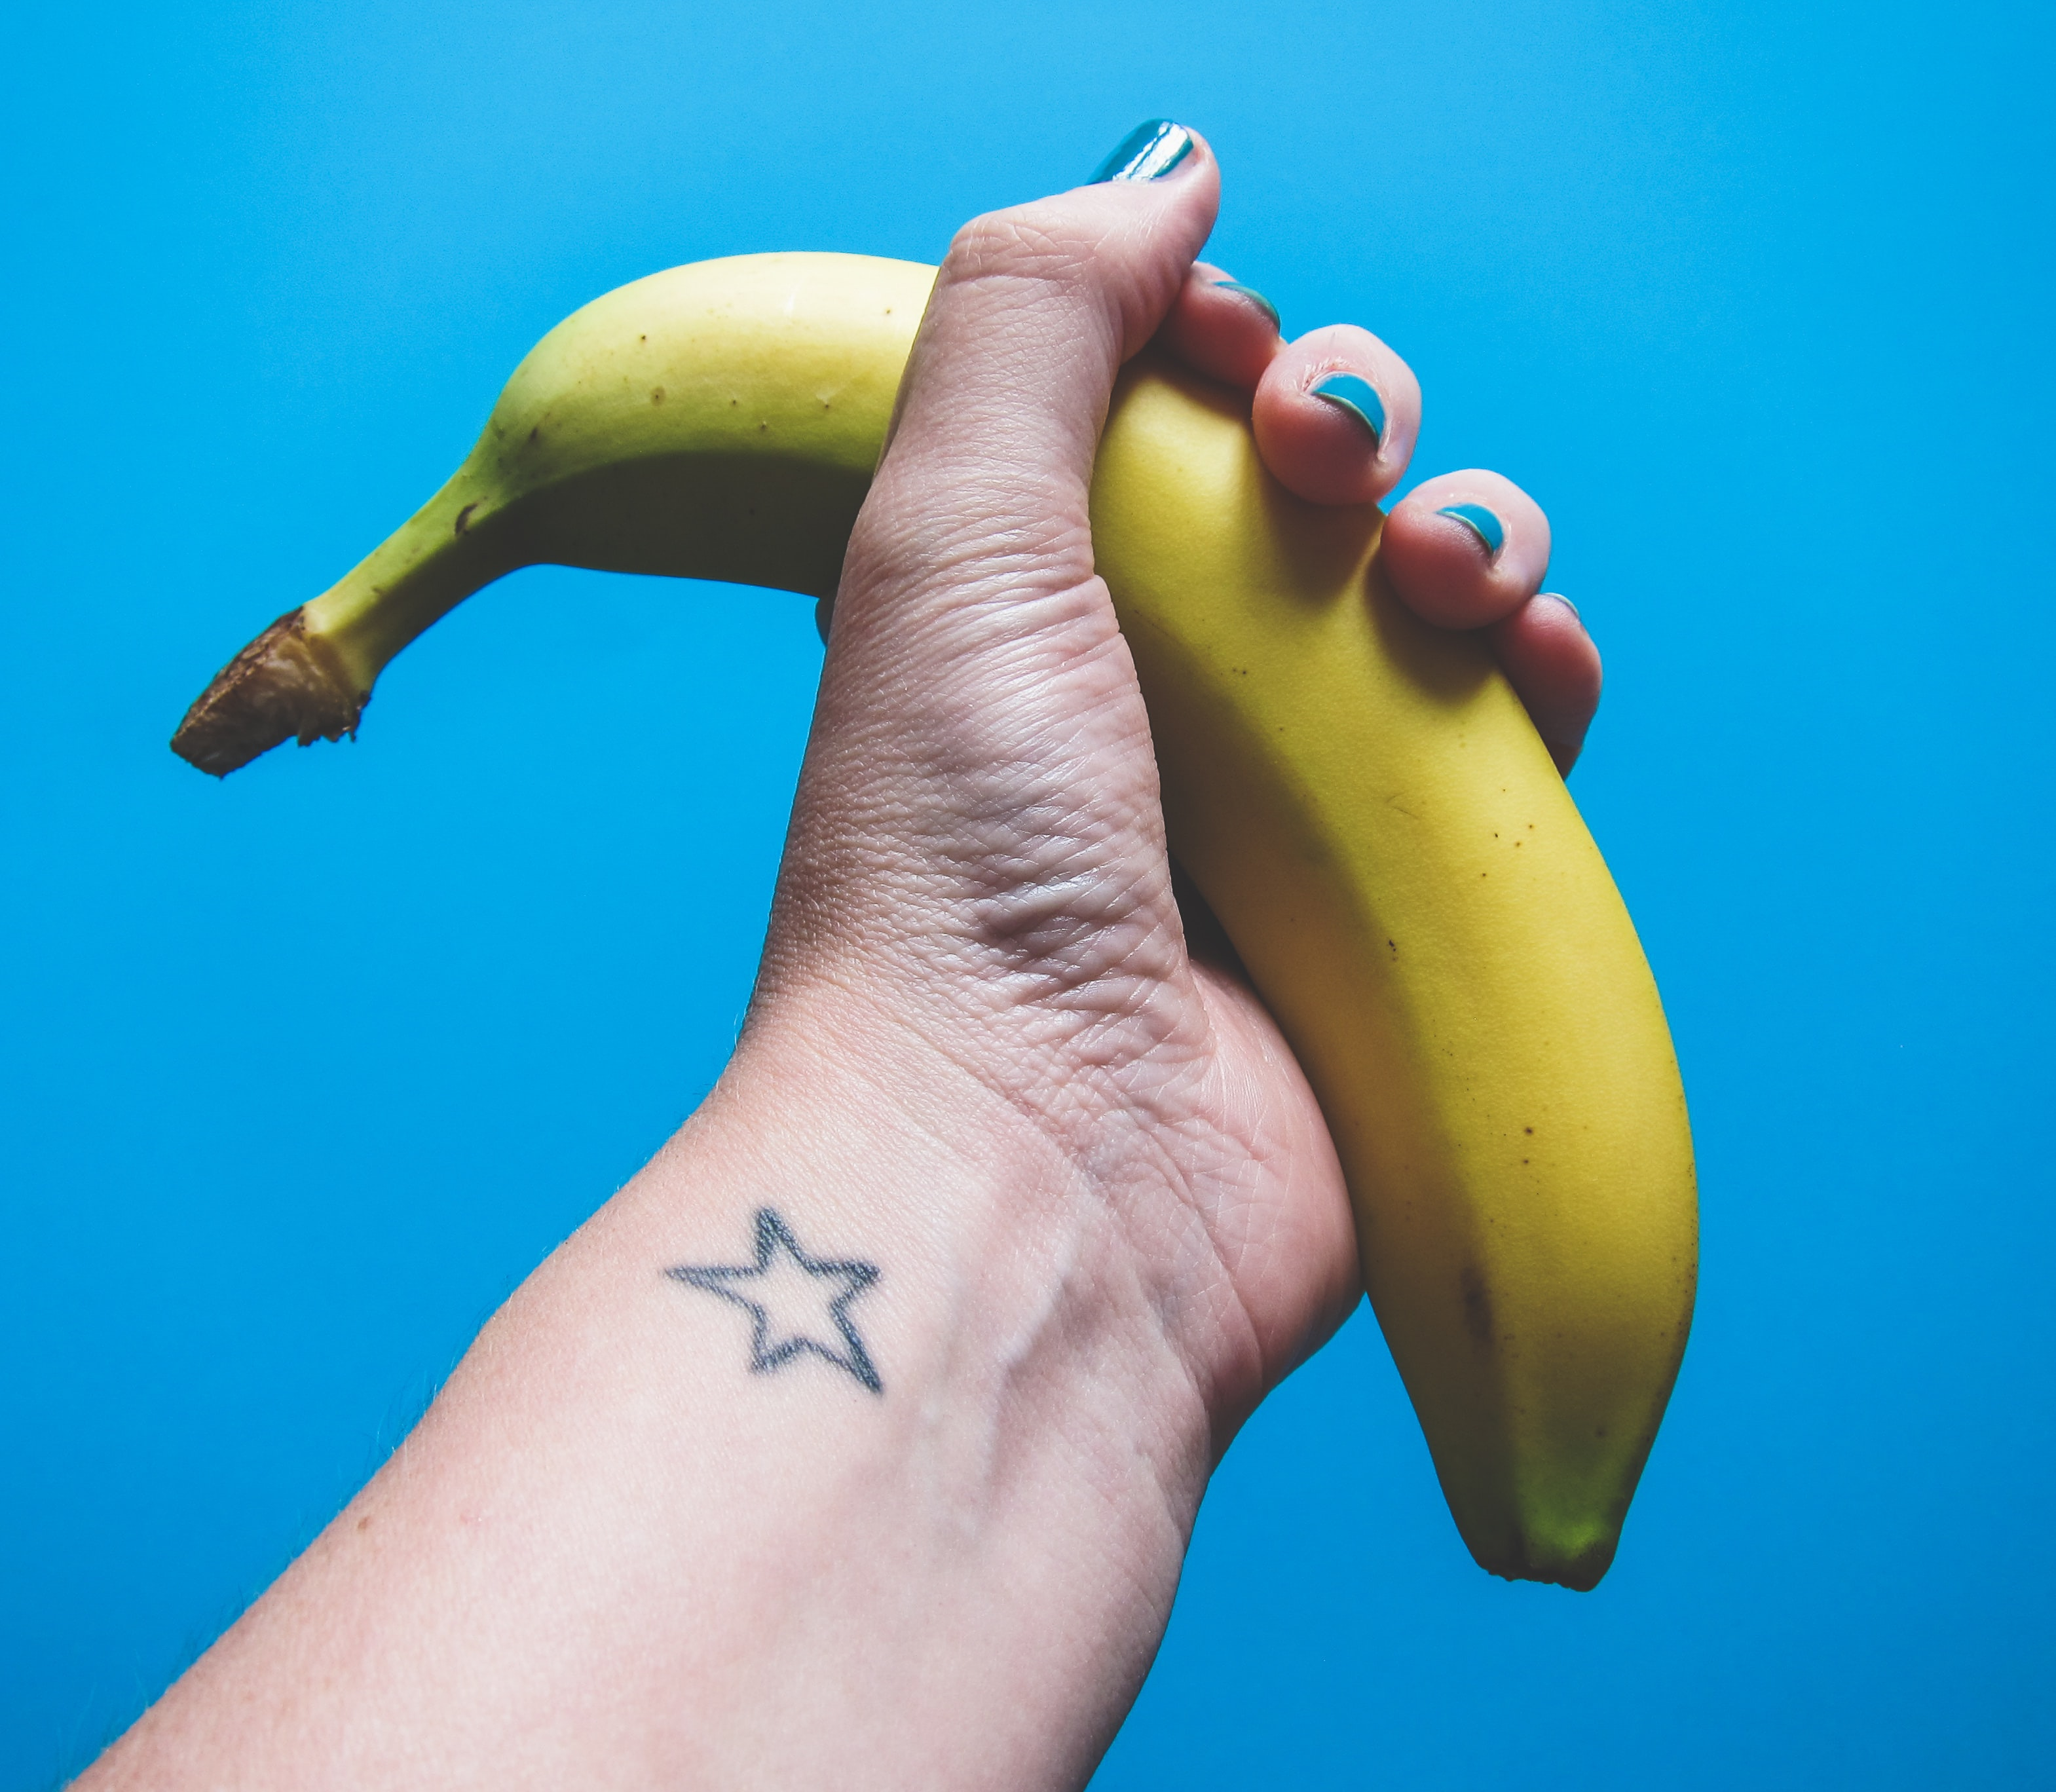 person holding ripe banana